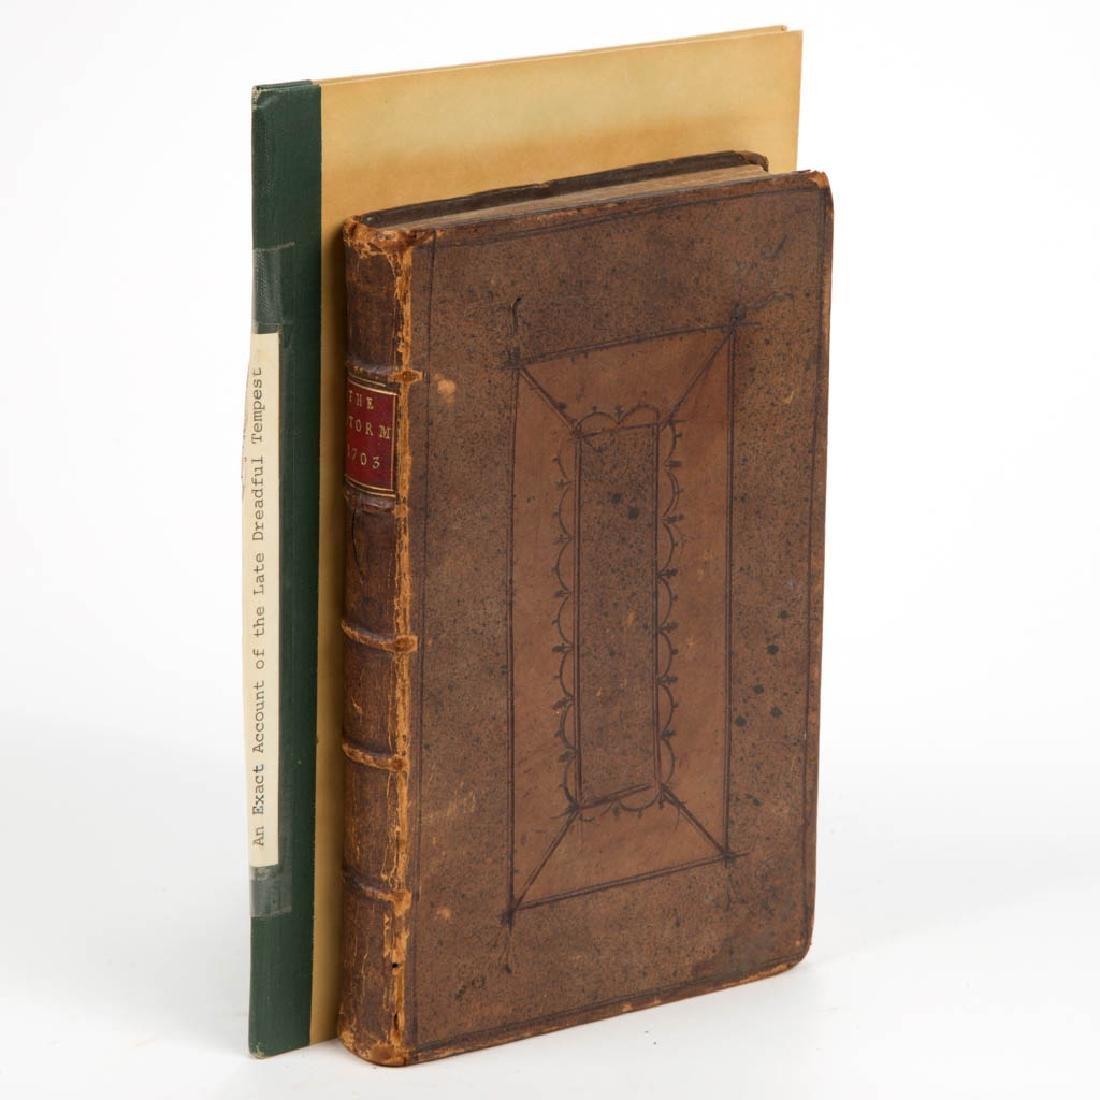 BRITISH HISTORICAL METEOROLOGY / JOURNALISM VOLUME